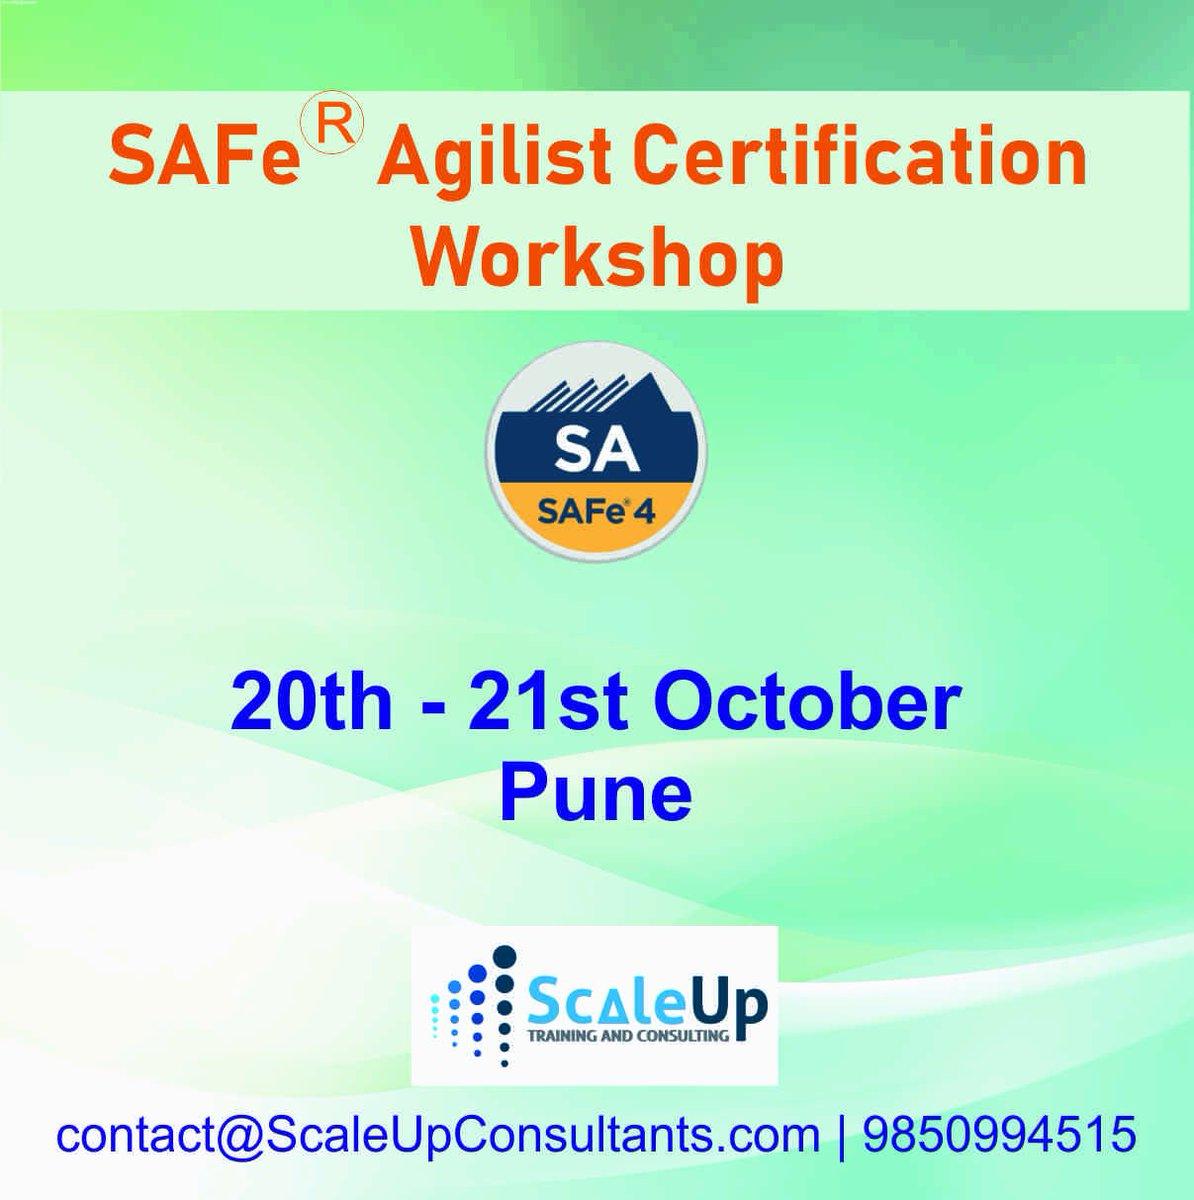 Scaleup Consultants Scaleuppune Twitter